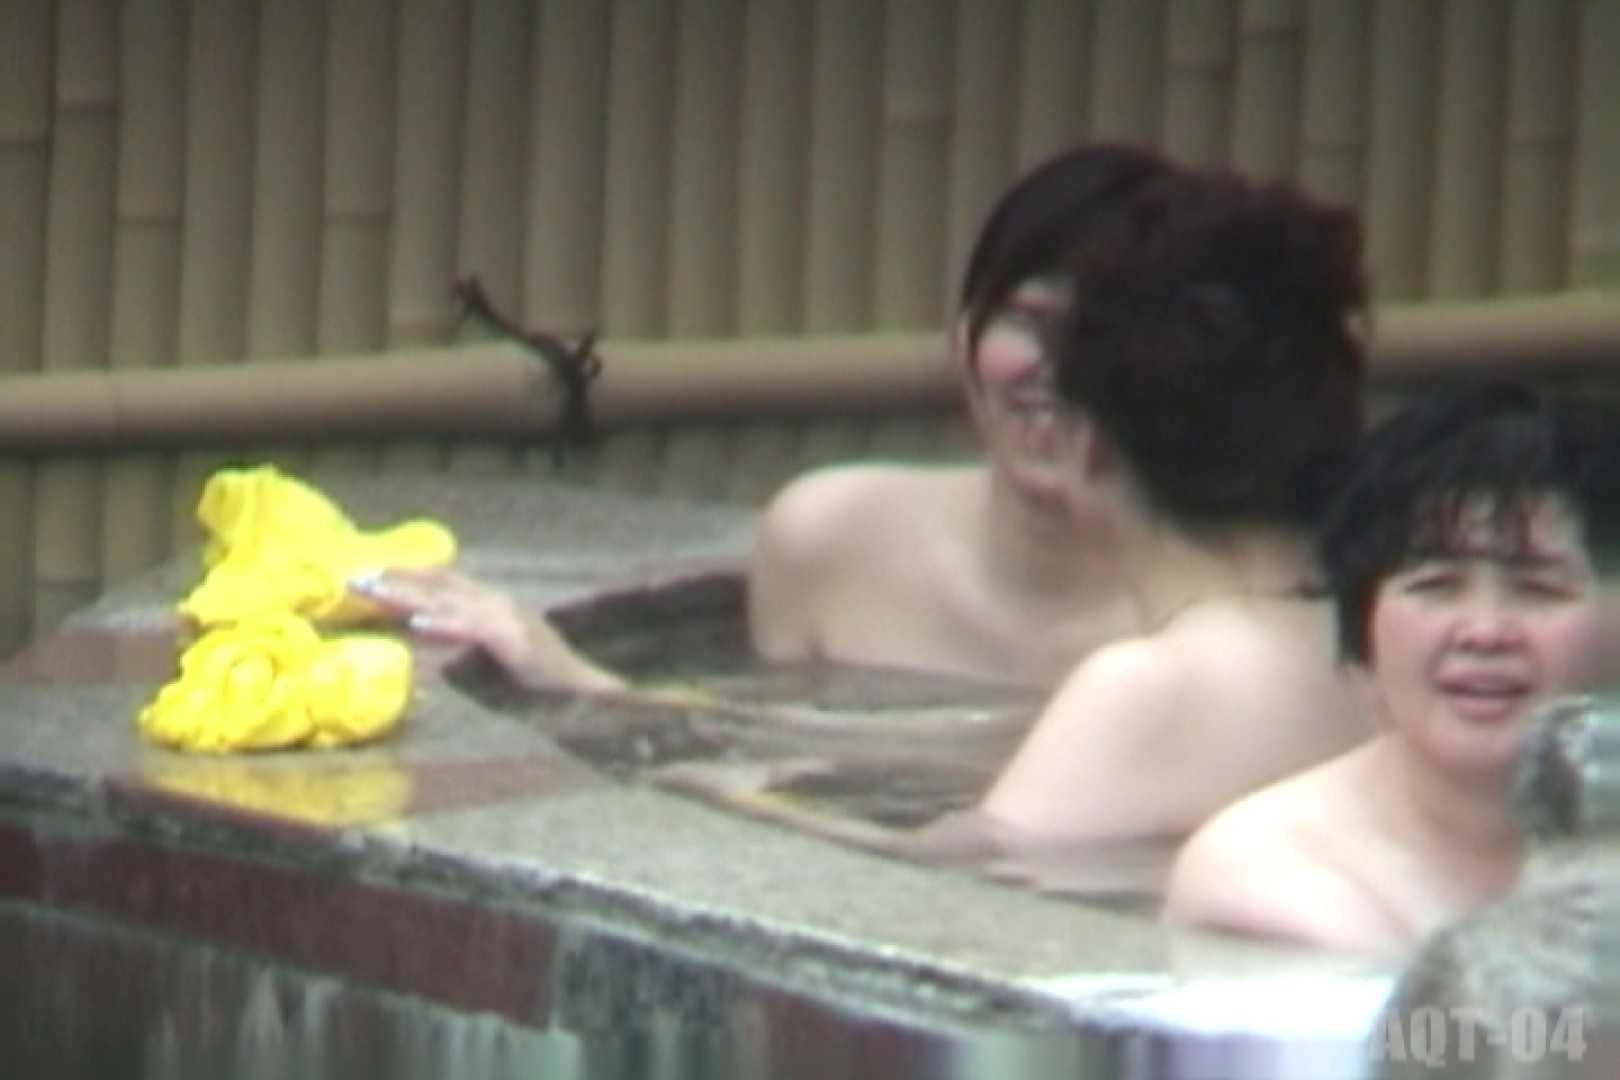 Aquaな露天風呂Vol.743 盗撮師作品 オマンコ無修正動画無料 91pic 5